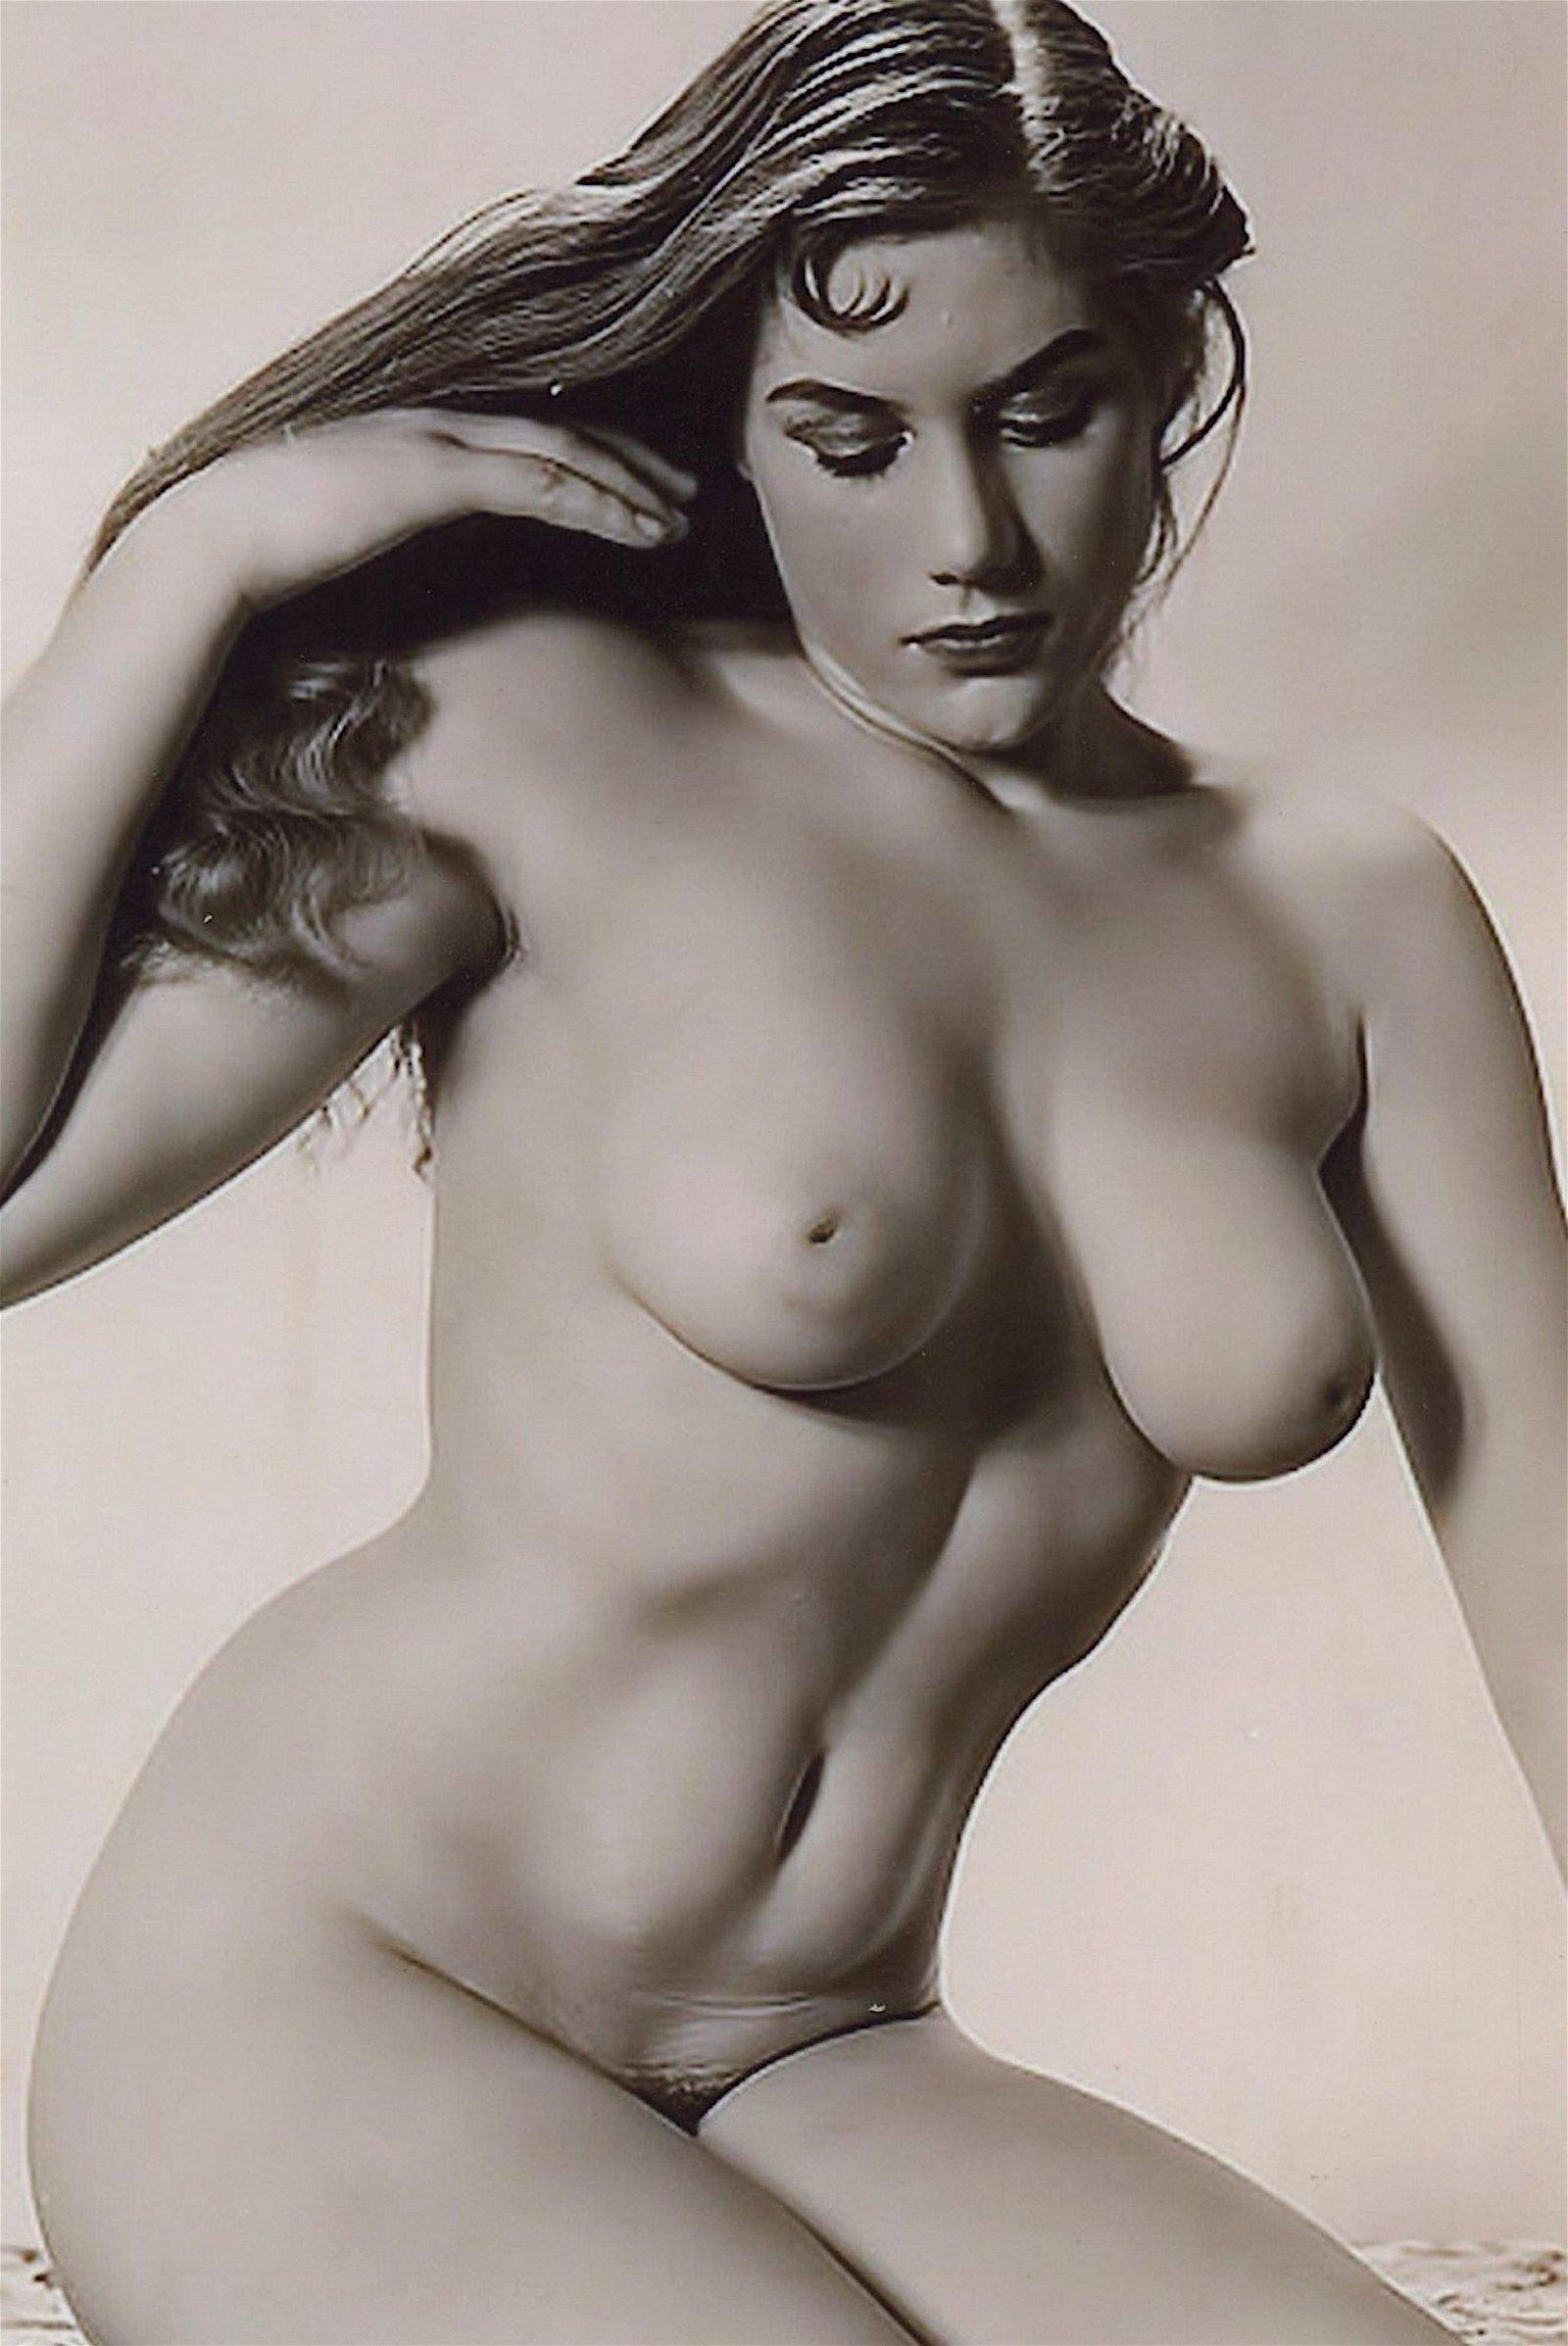 Photo Erotic Nude Women Reproduction in Fujifilm Paper